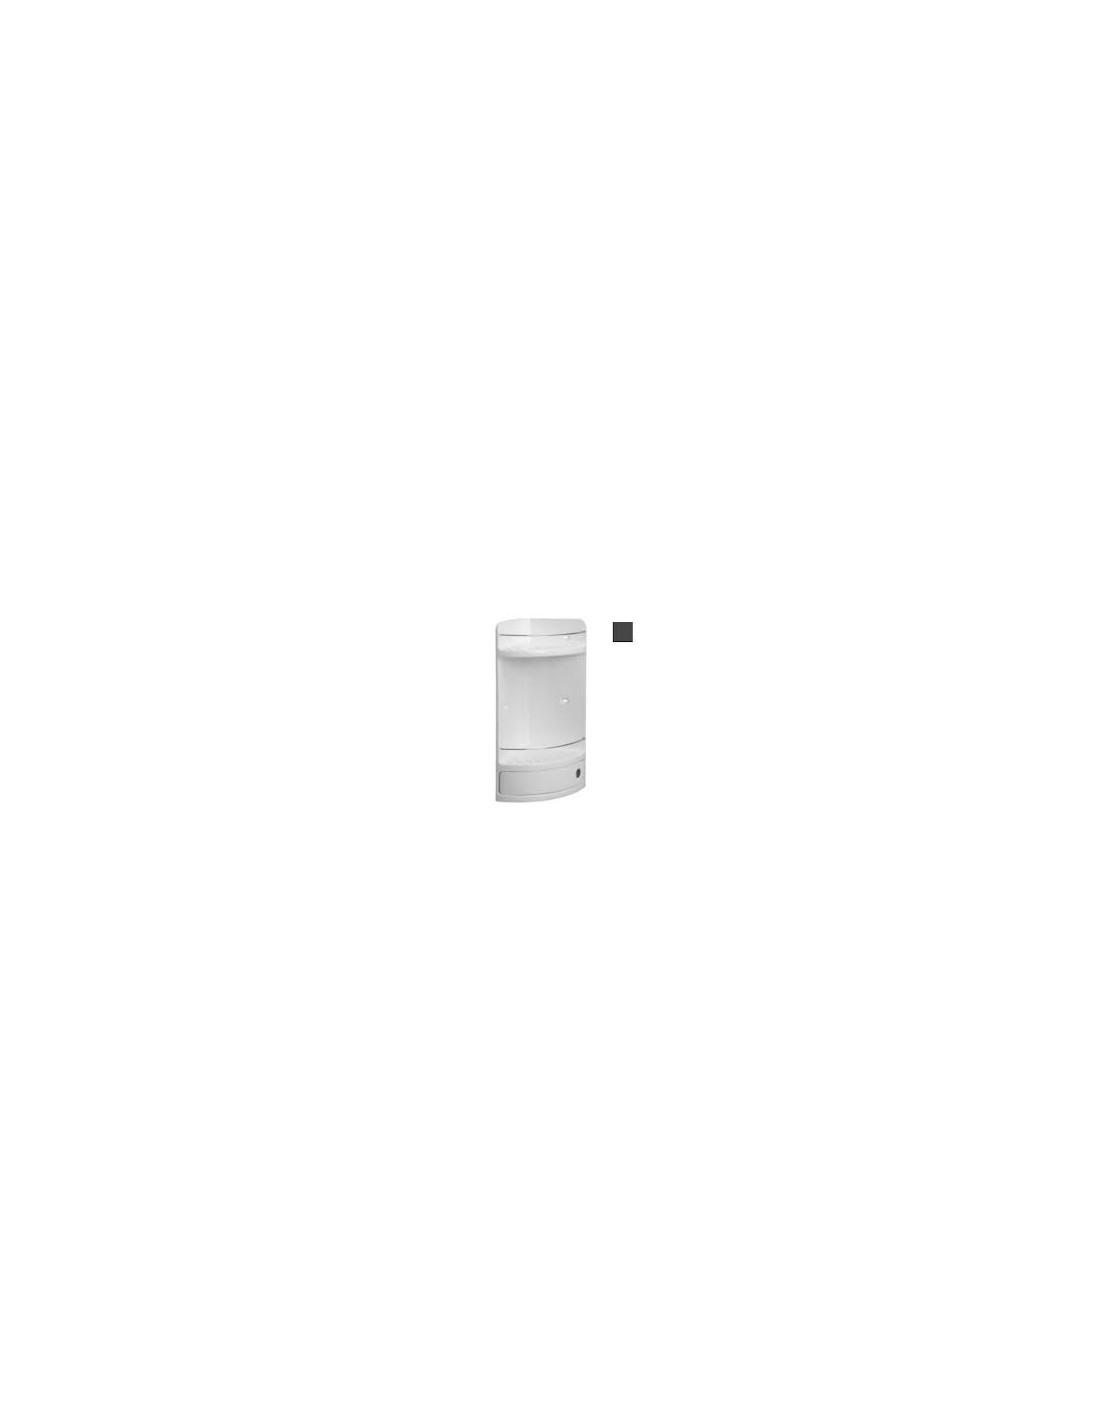 Accesorios De Baño Tatay: rinconera de baño con cajon rinconera de baño con cajón marca tatay